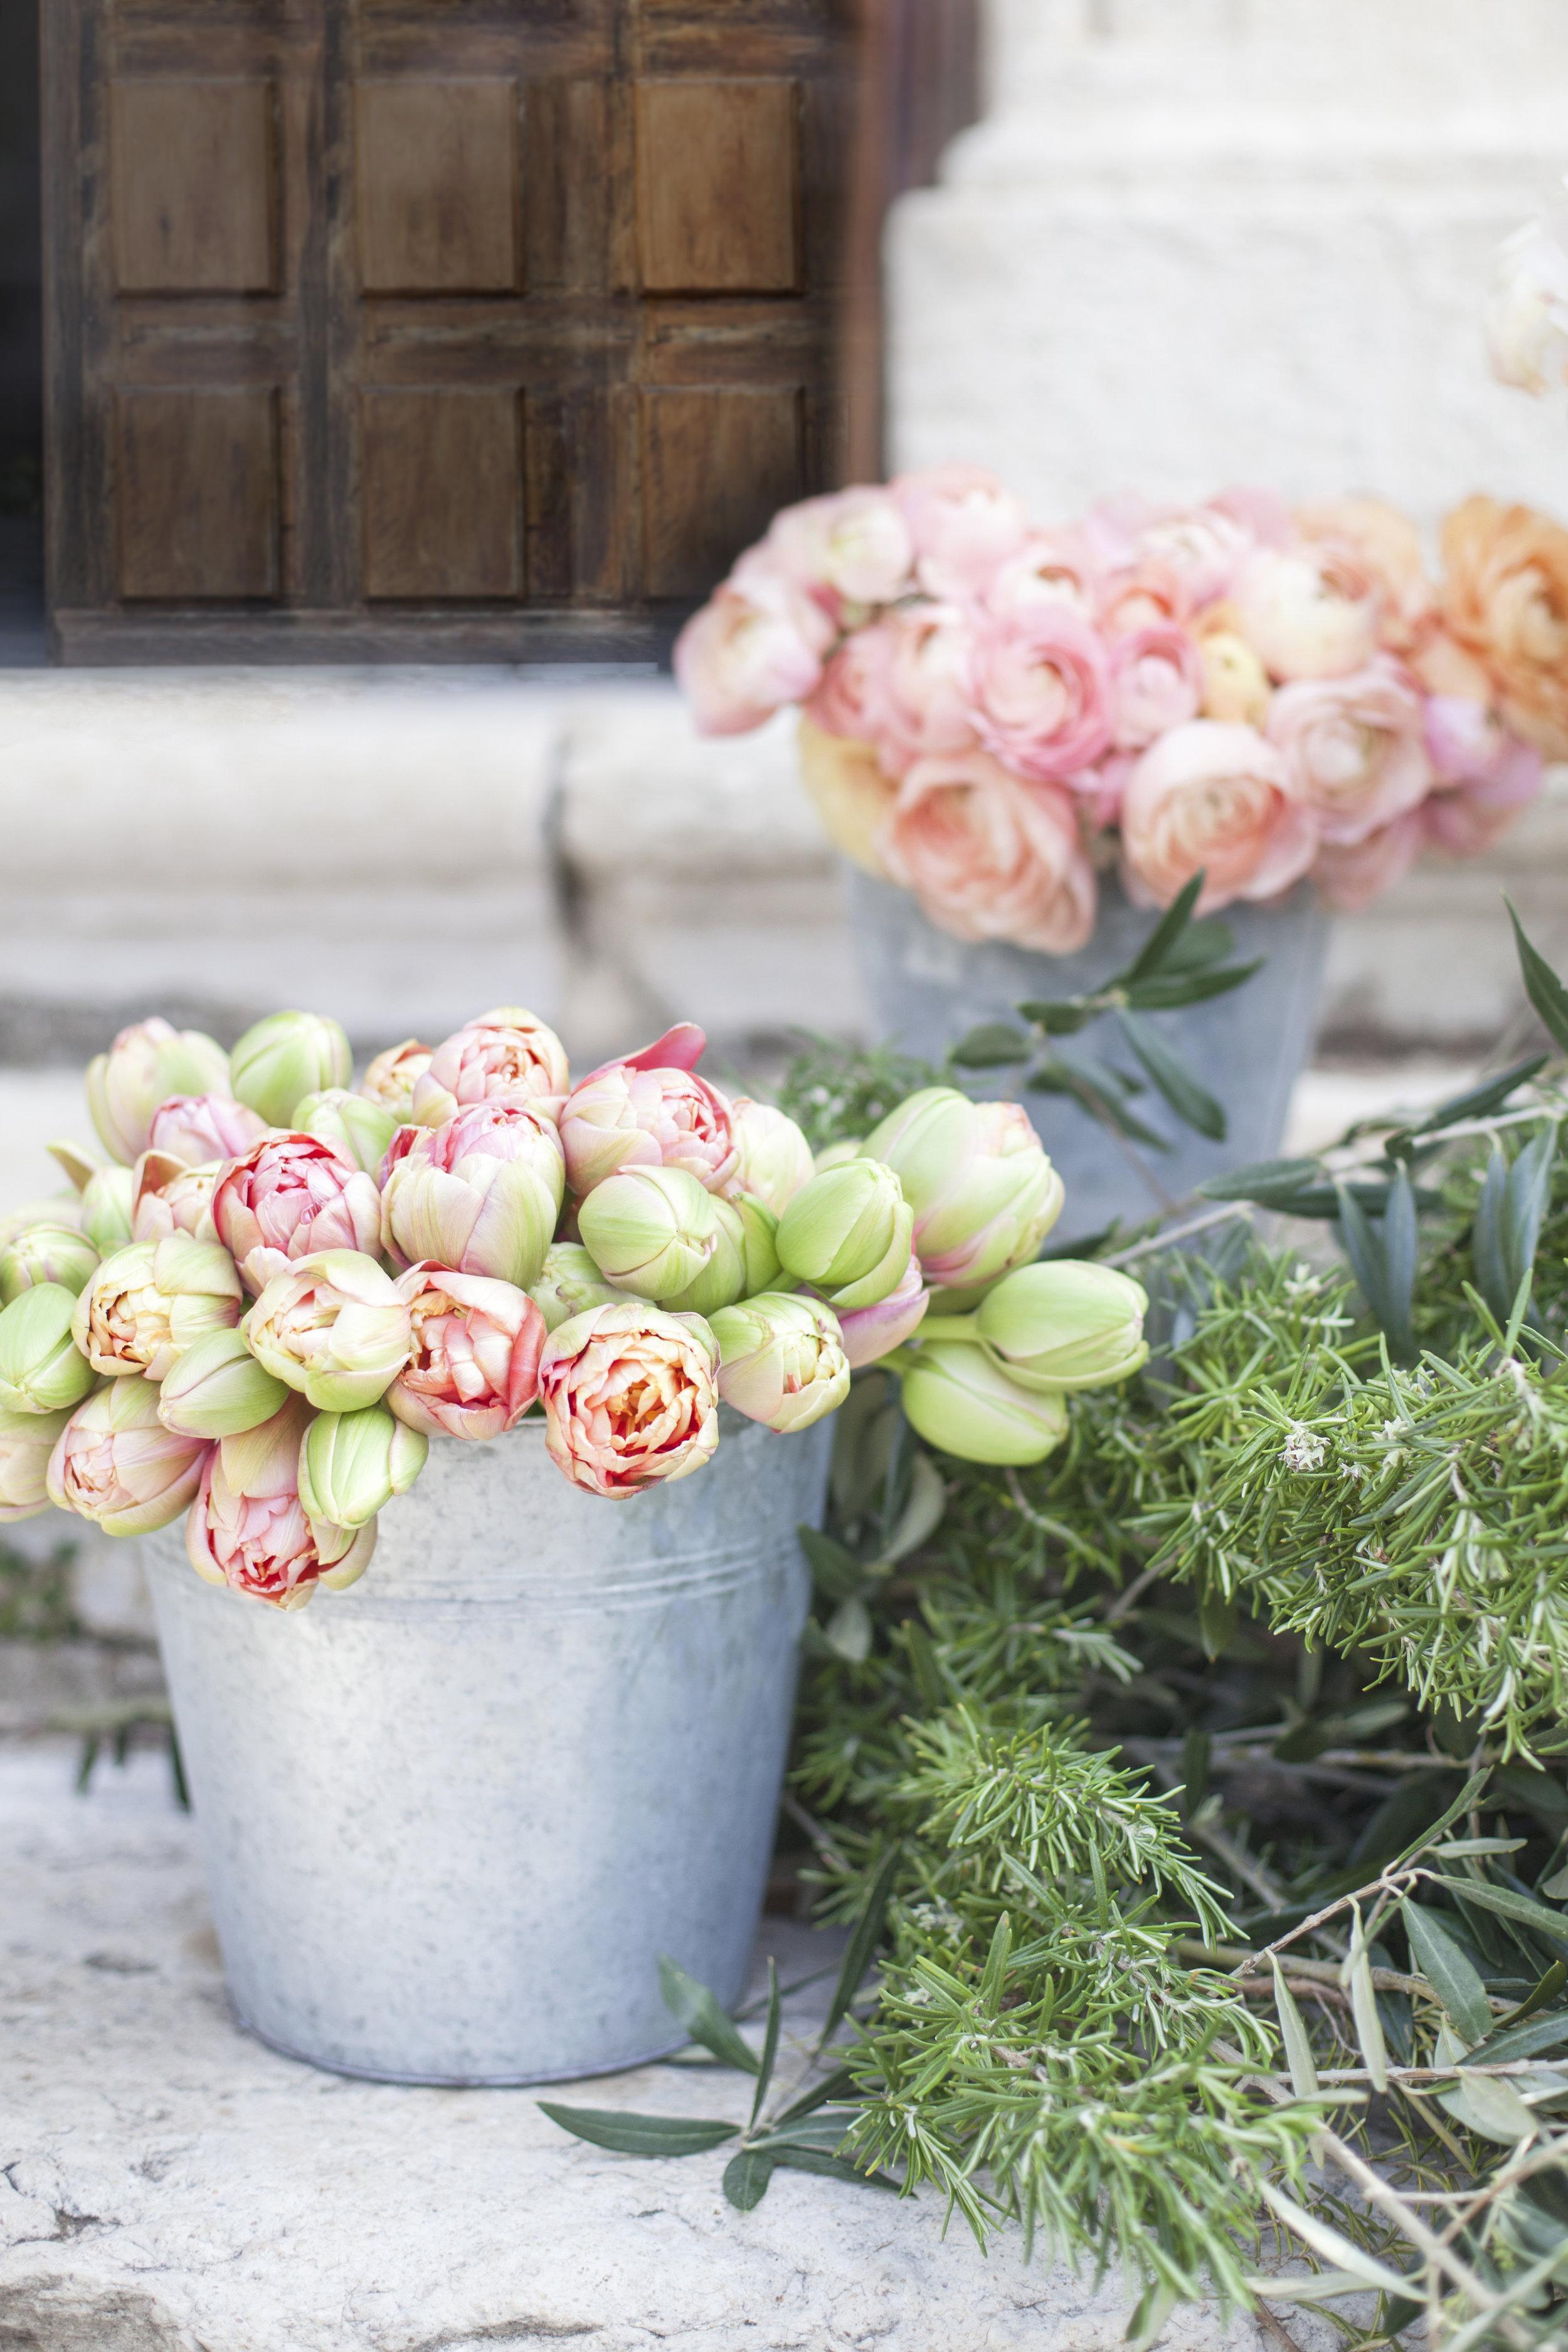 france-provence-floral-workshop-sandra-sigman-sharon-santoni (23).jpg